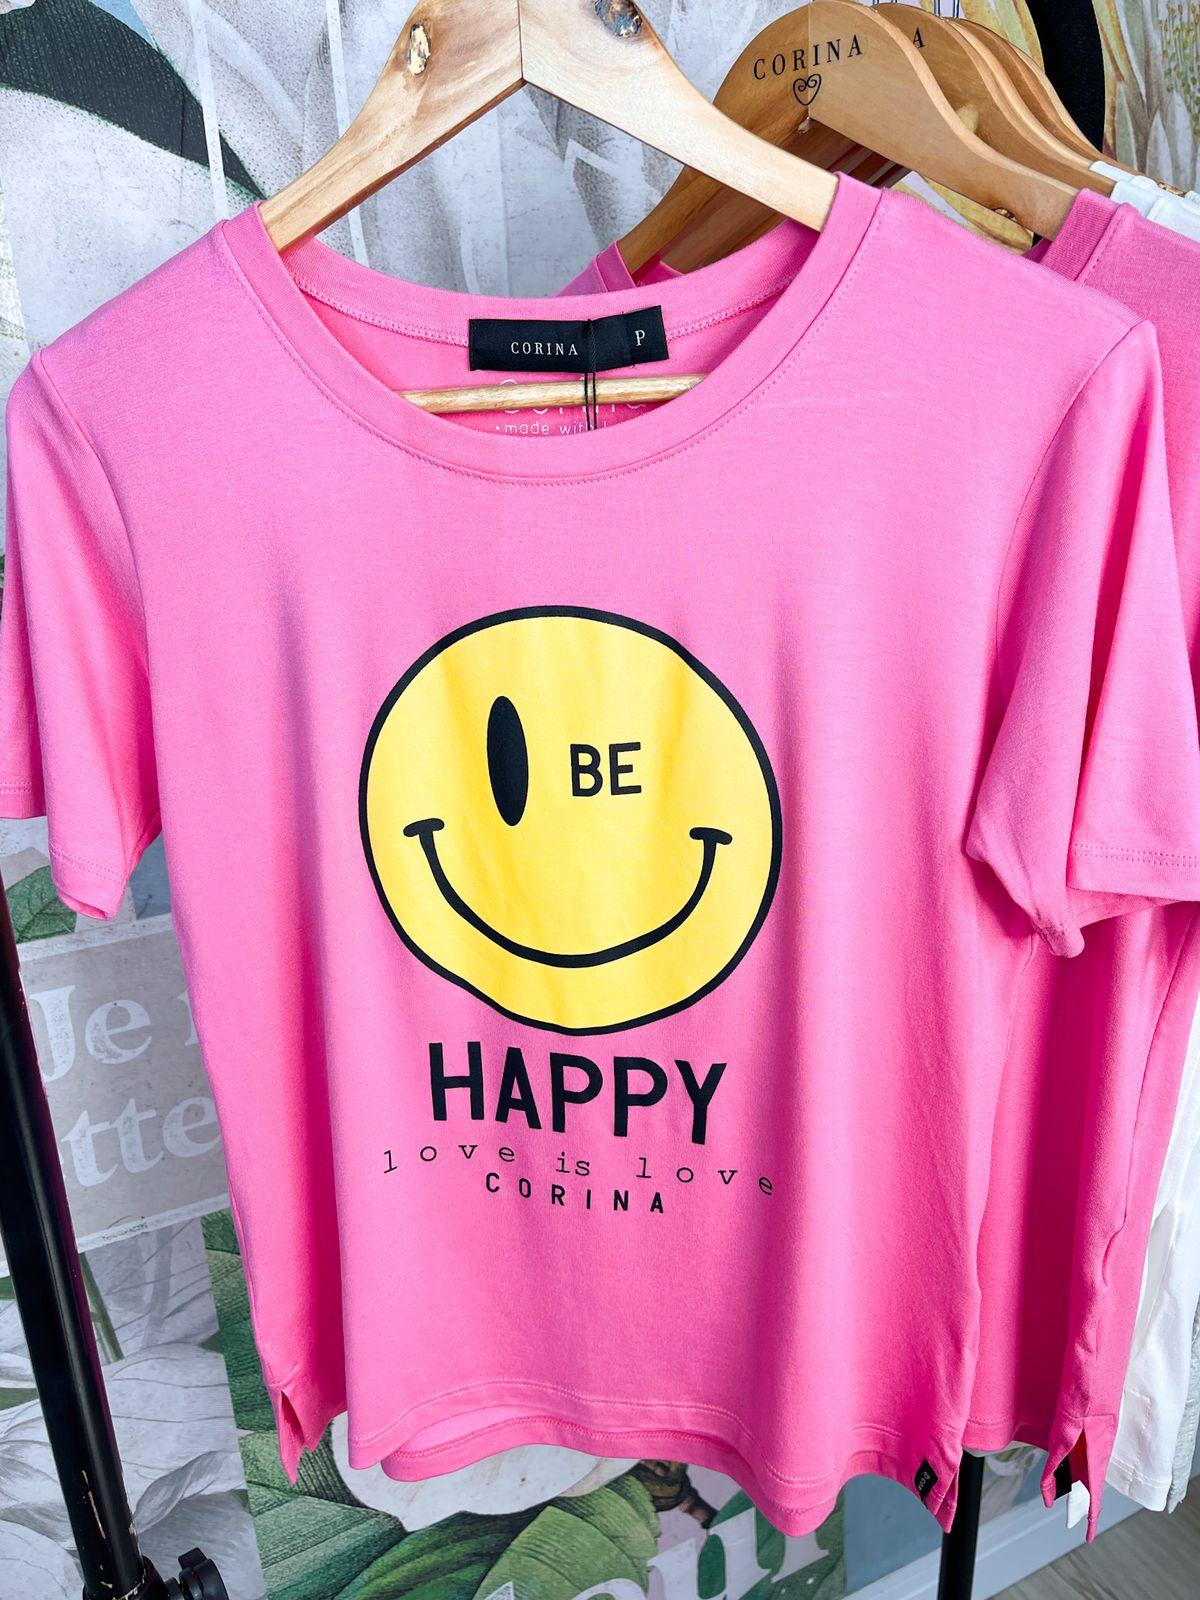 Corina T-Shirt Viscose - Be Happy - Rosa